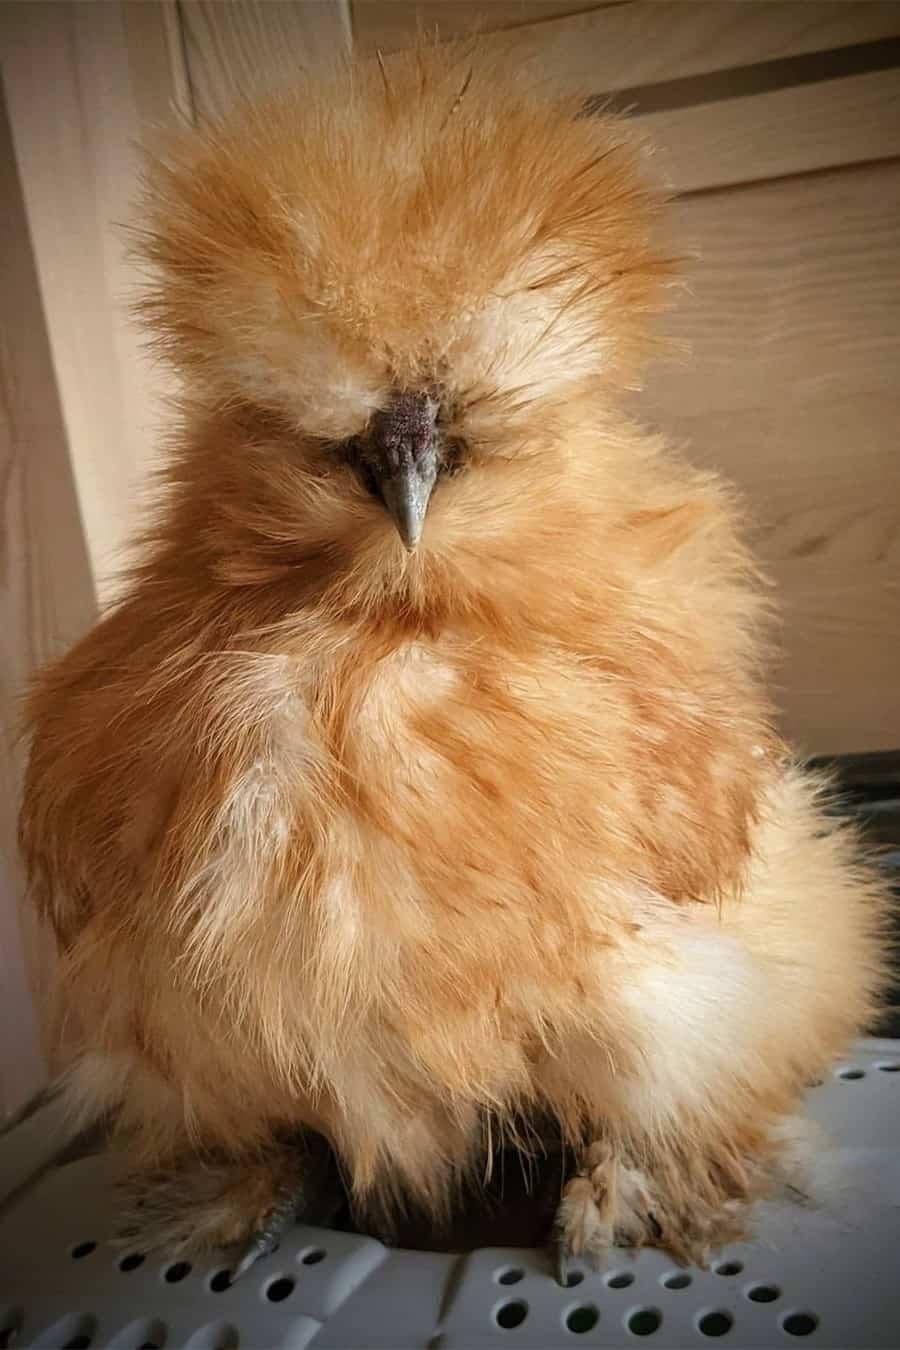 yellow chicken breeds Buff Silkies